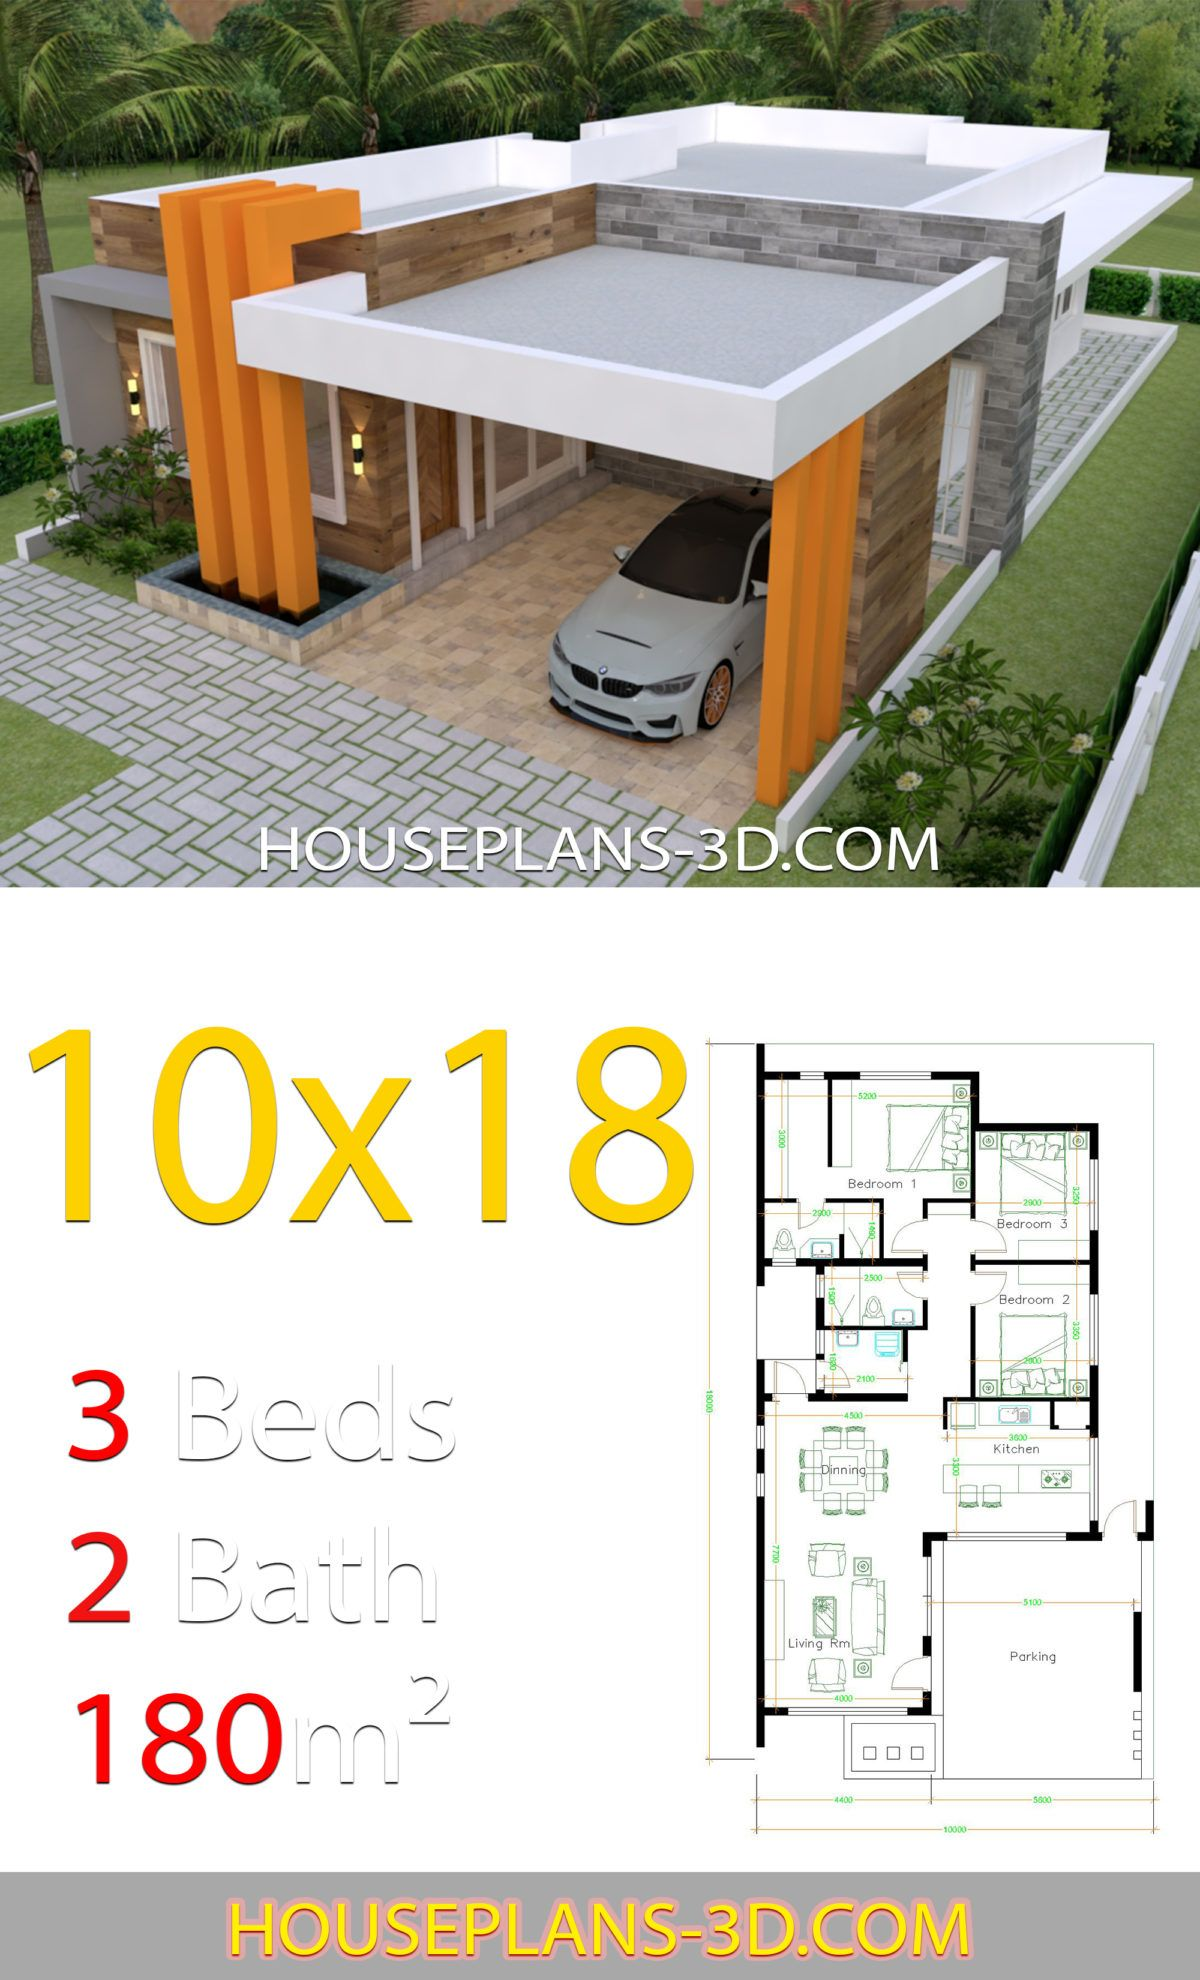 House Design 10x18 With 3 Bedrooms Terrace Roof House Plans 3d Projetos De Casas Gratis Projetos De Casas Pequenas Projetos De Casas Modernas